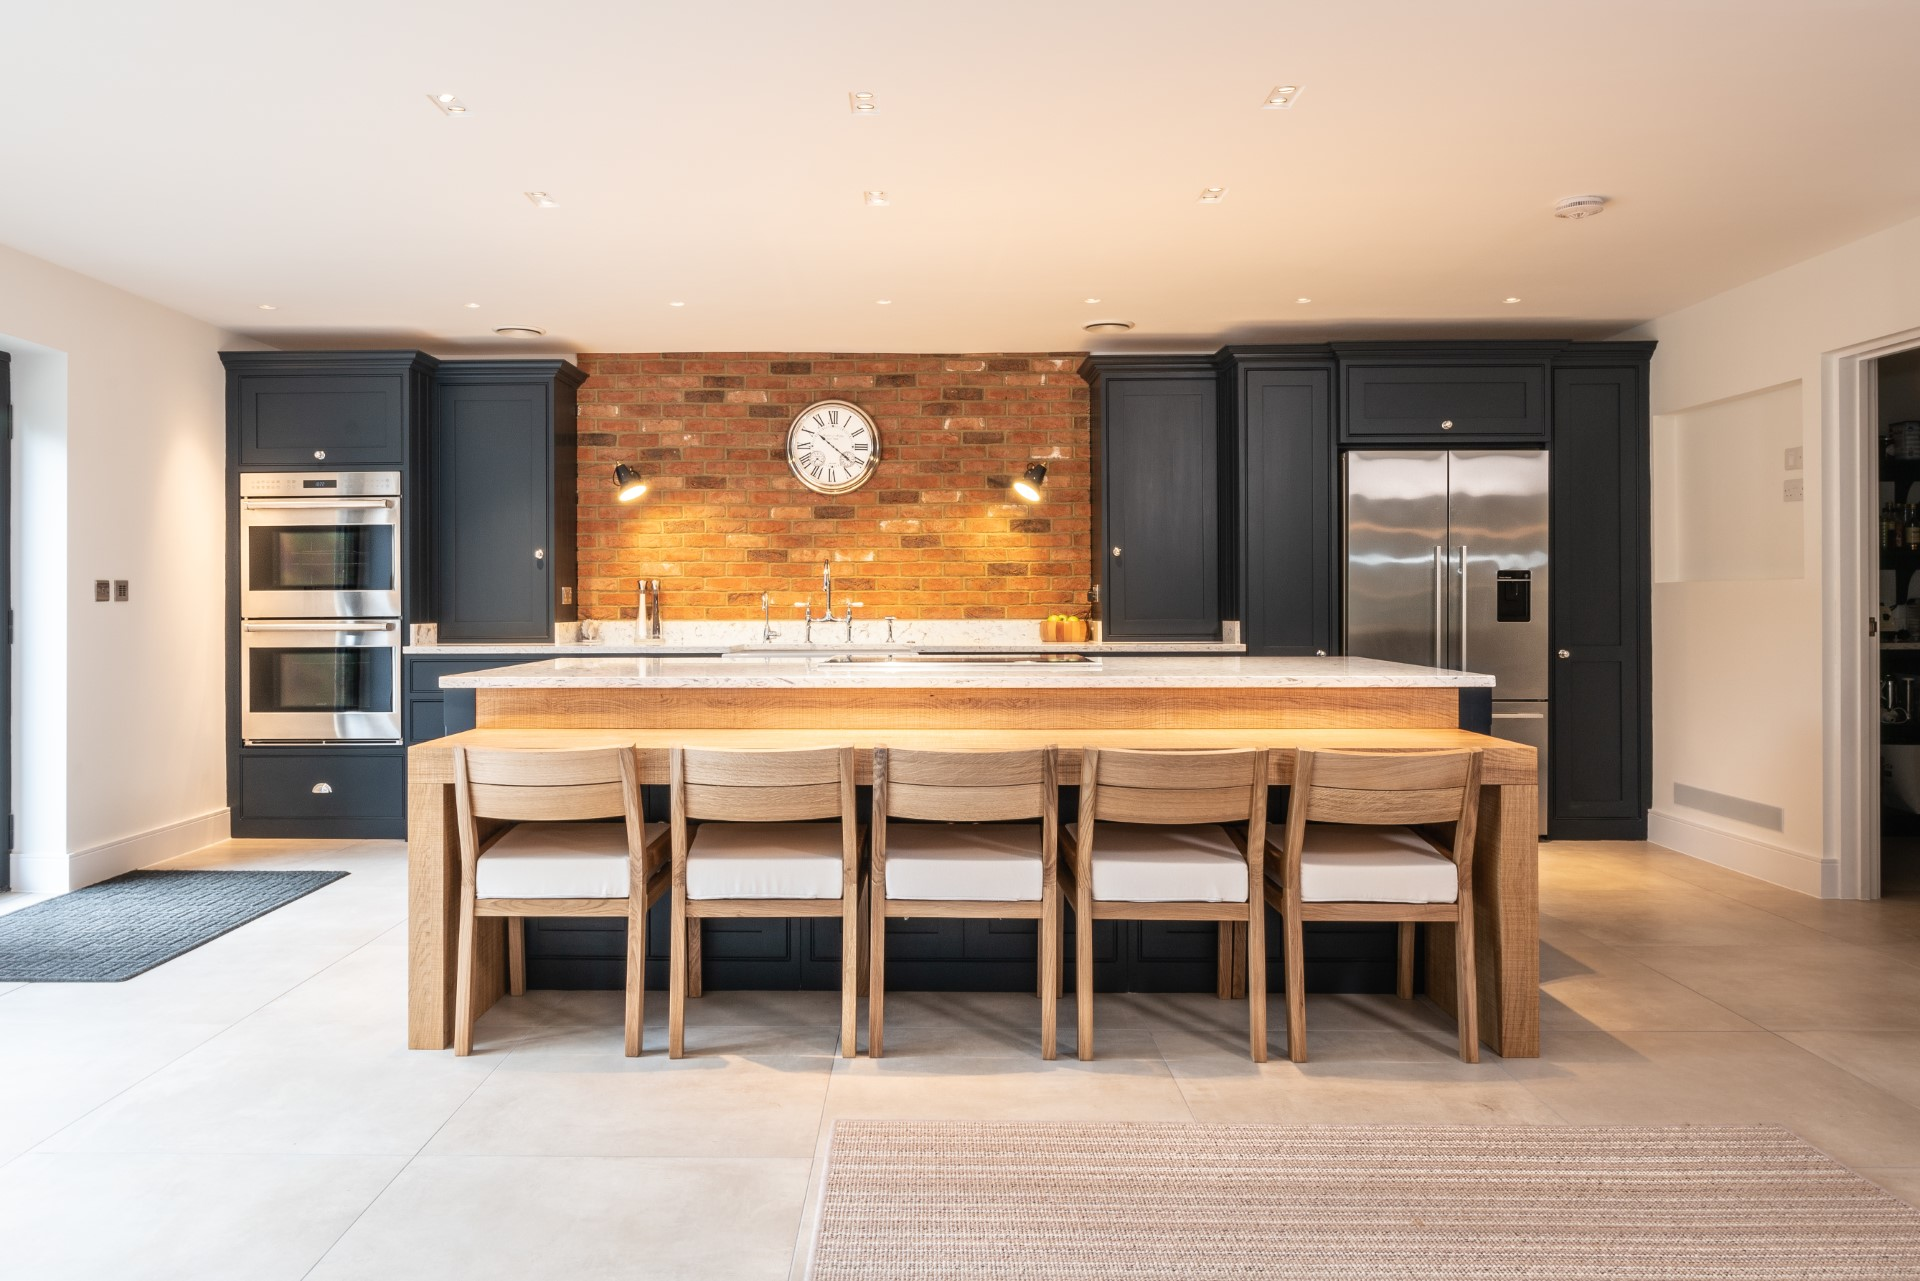 Creating A Single Wall Kitchen With An Island Nicholas Bridger